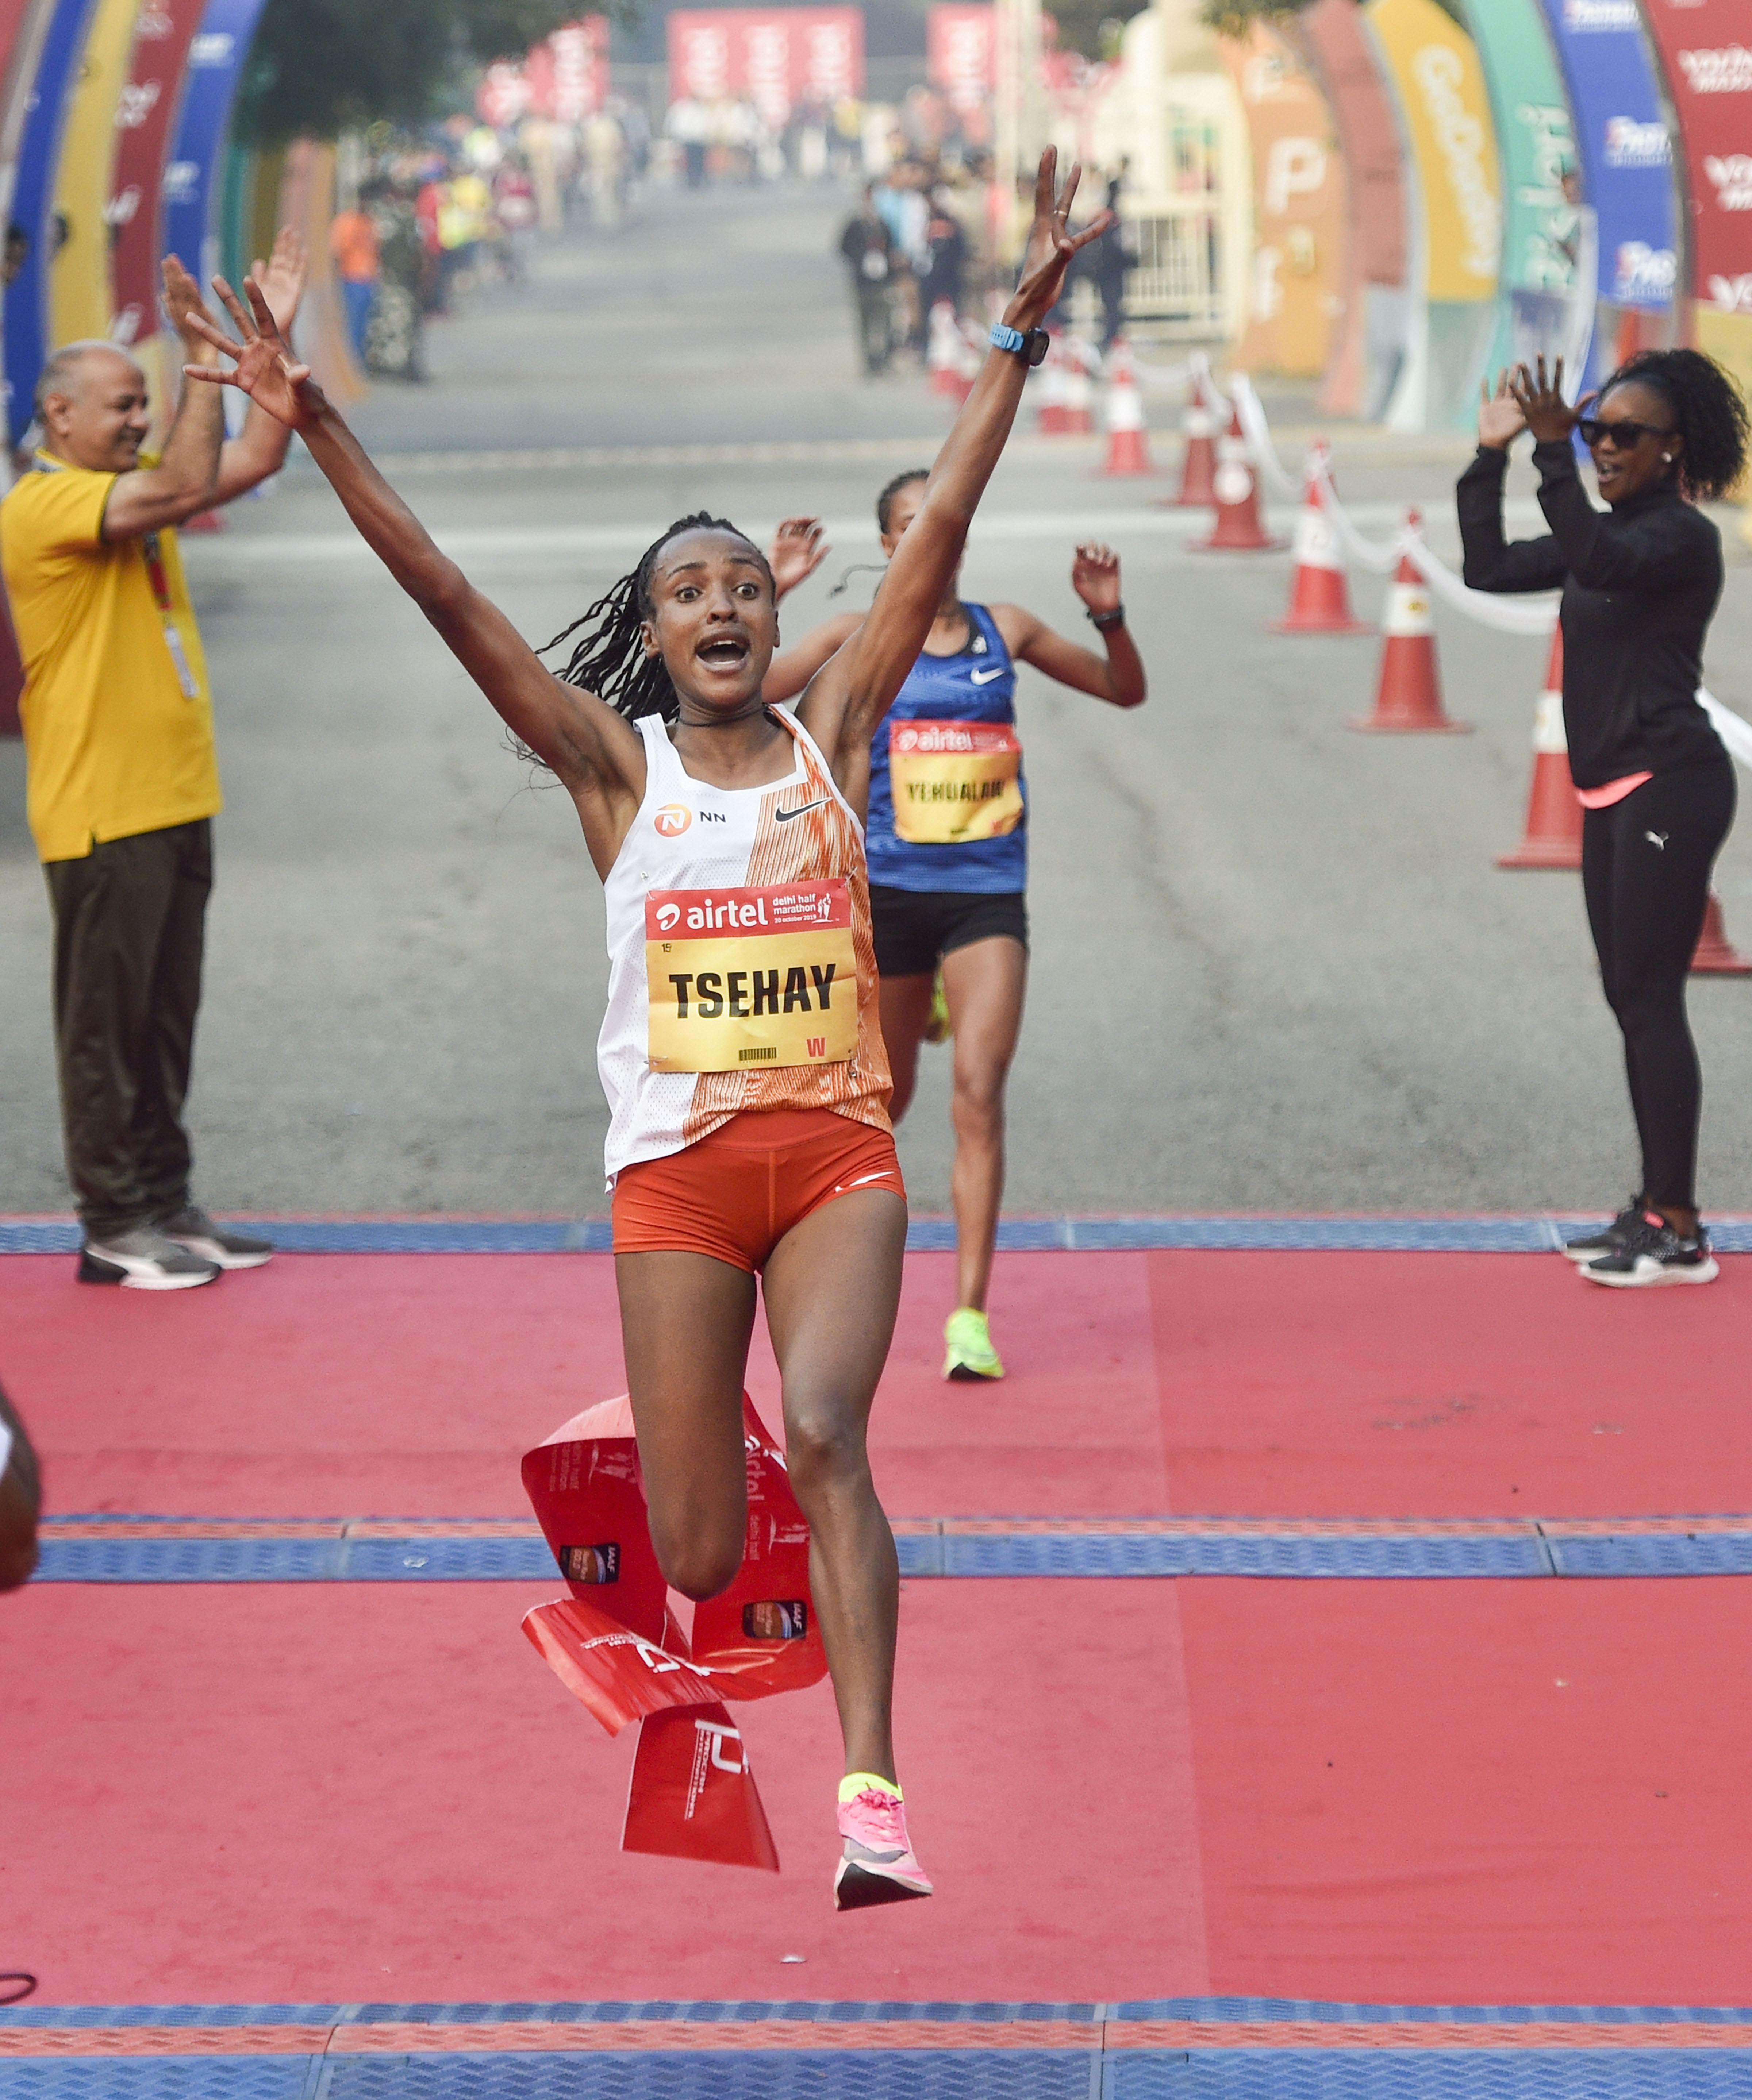 Defending champion Tsehay Gemechu crosses the finish line to retain her women's title at the 15th Airtel Delhi Half Marathon, at the Jawaharlal Nehru Stadium in New Delhi, Sunday, October 20, 2019